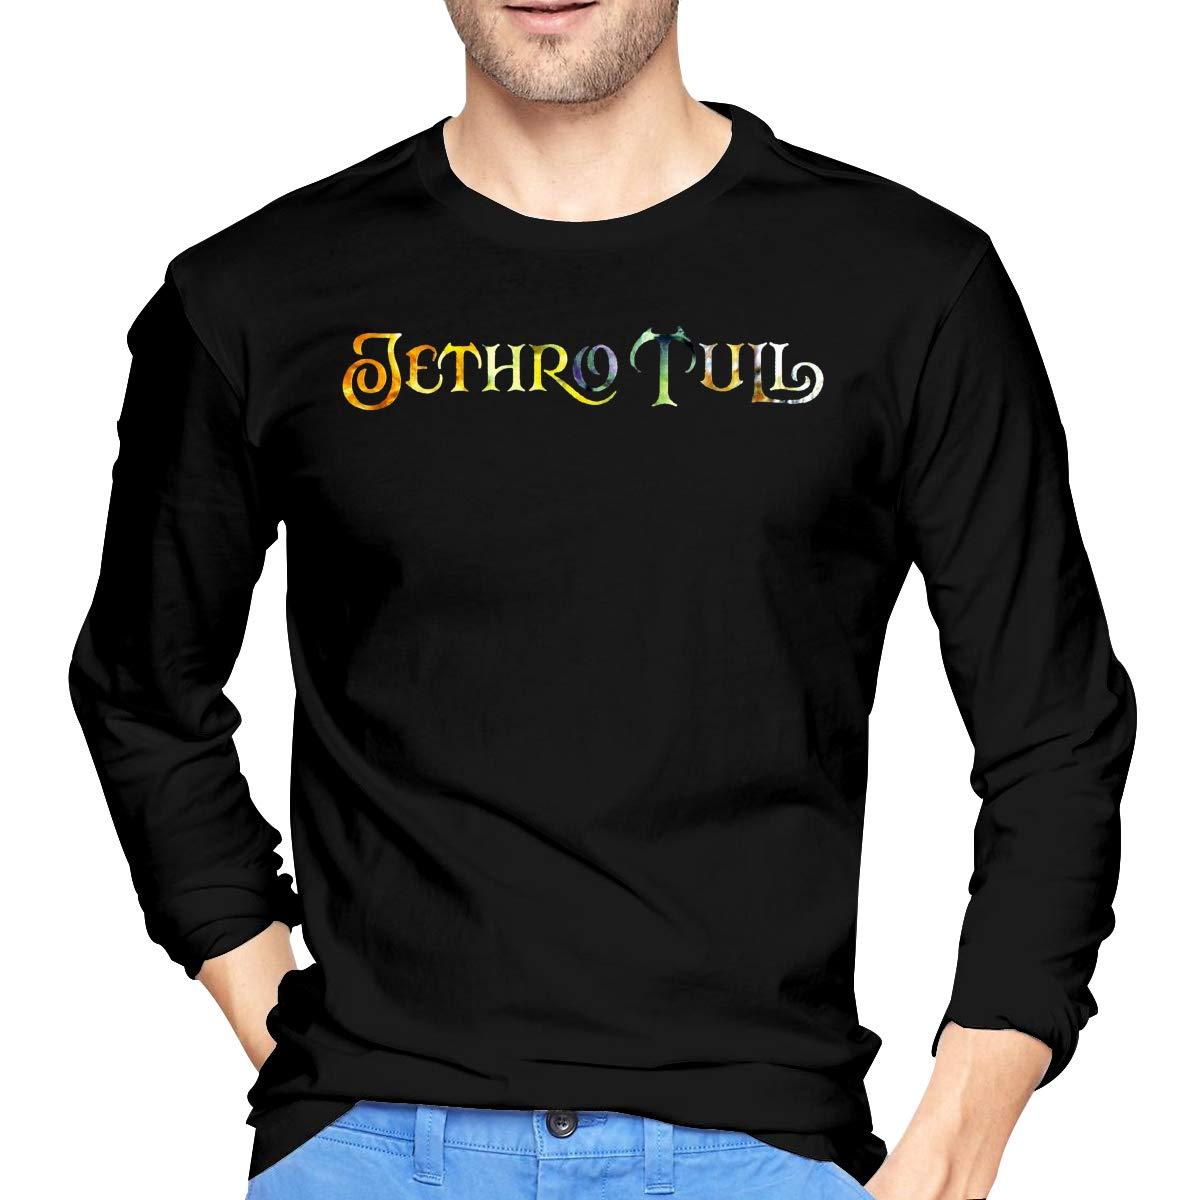 Qiyyqi Jethro Tull S T Shirts Tees 1145